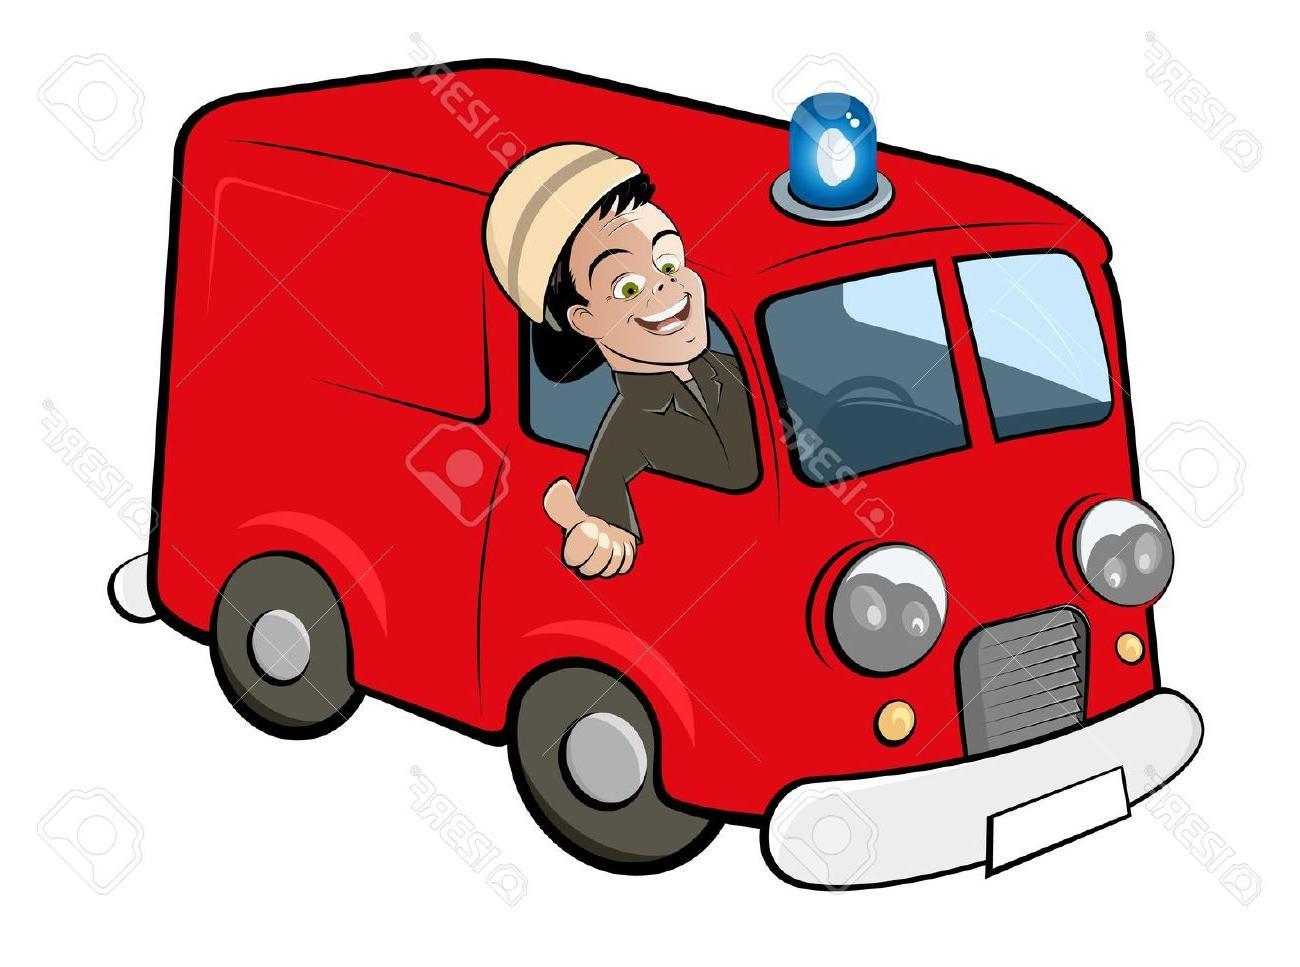 1300x967 Top 10 Cartoon Fire Truck Stock Vector Department Design